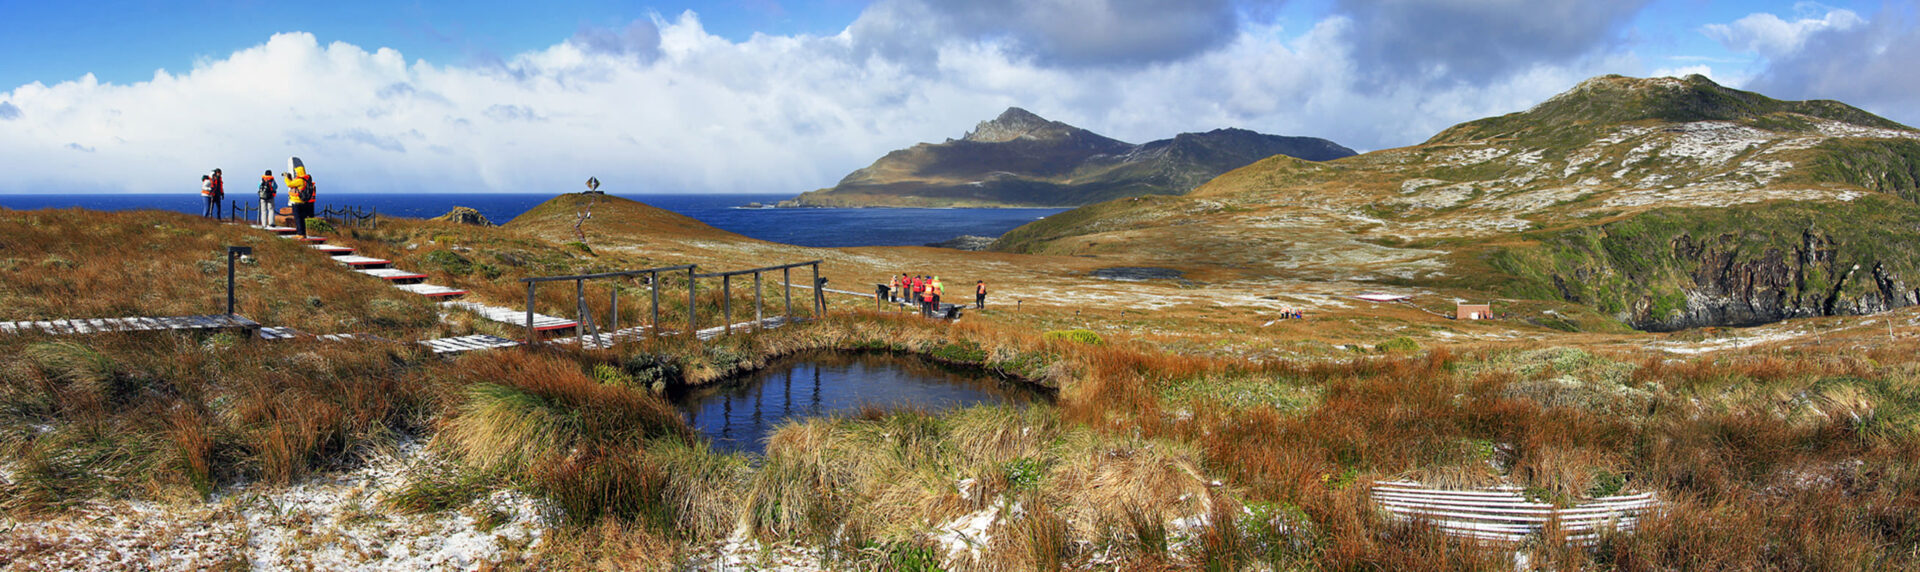 Chili Patagonie Reizen Cruise Vuurland